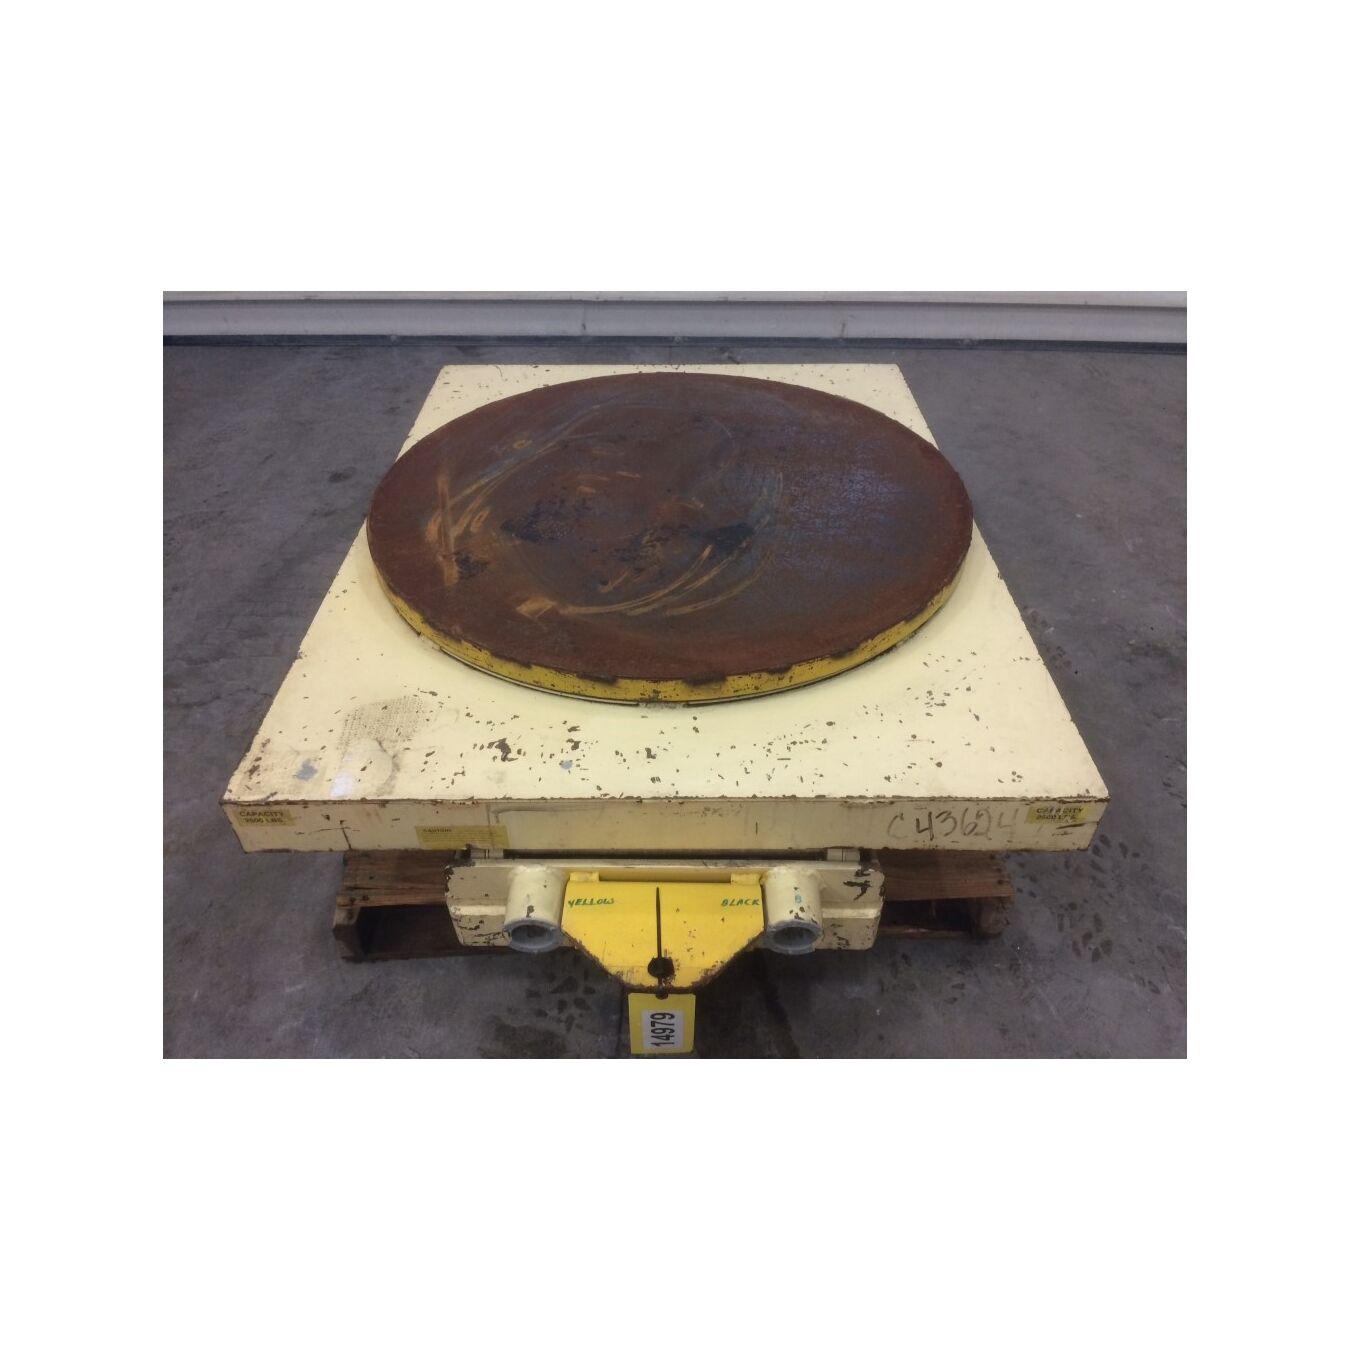 Used 2,500 lb capacity Southworth Electric Scissor Lift Table Model PLSH2-64